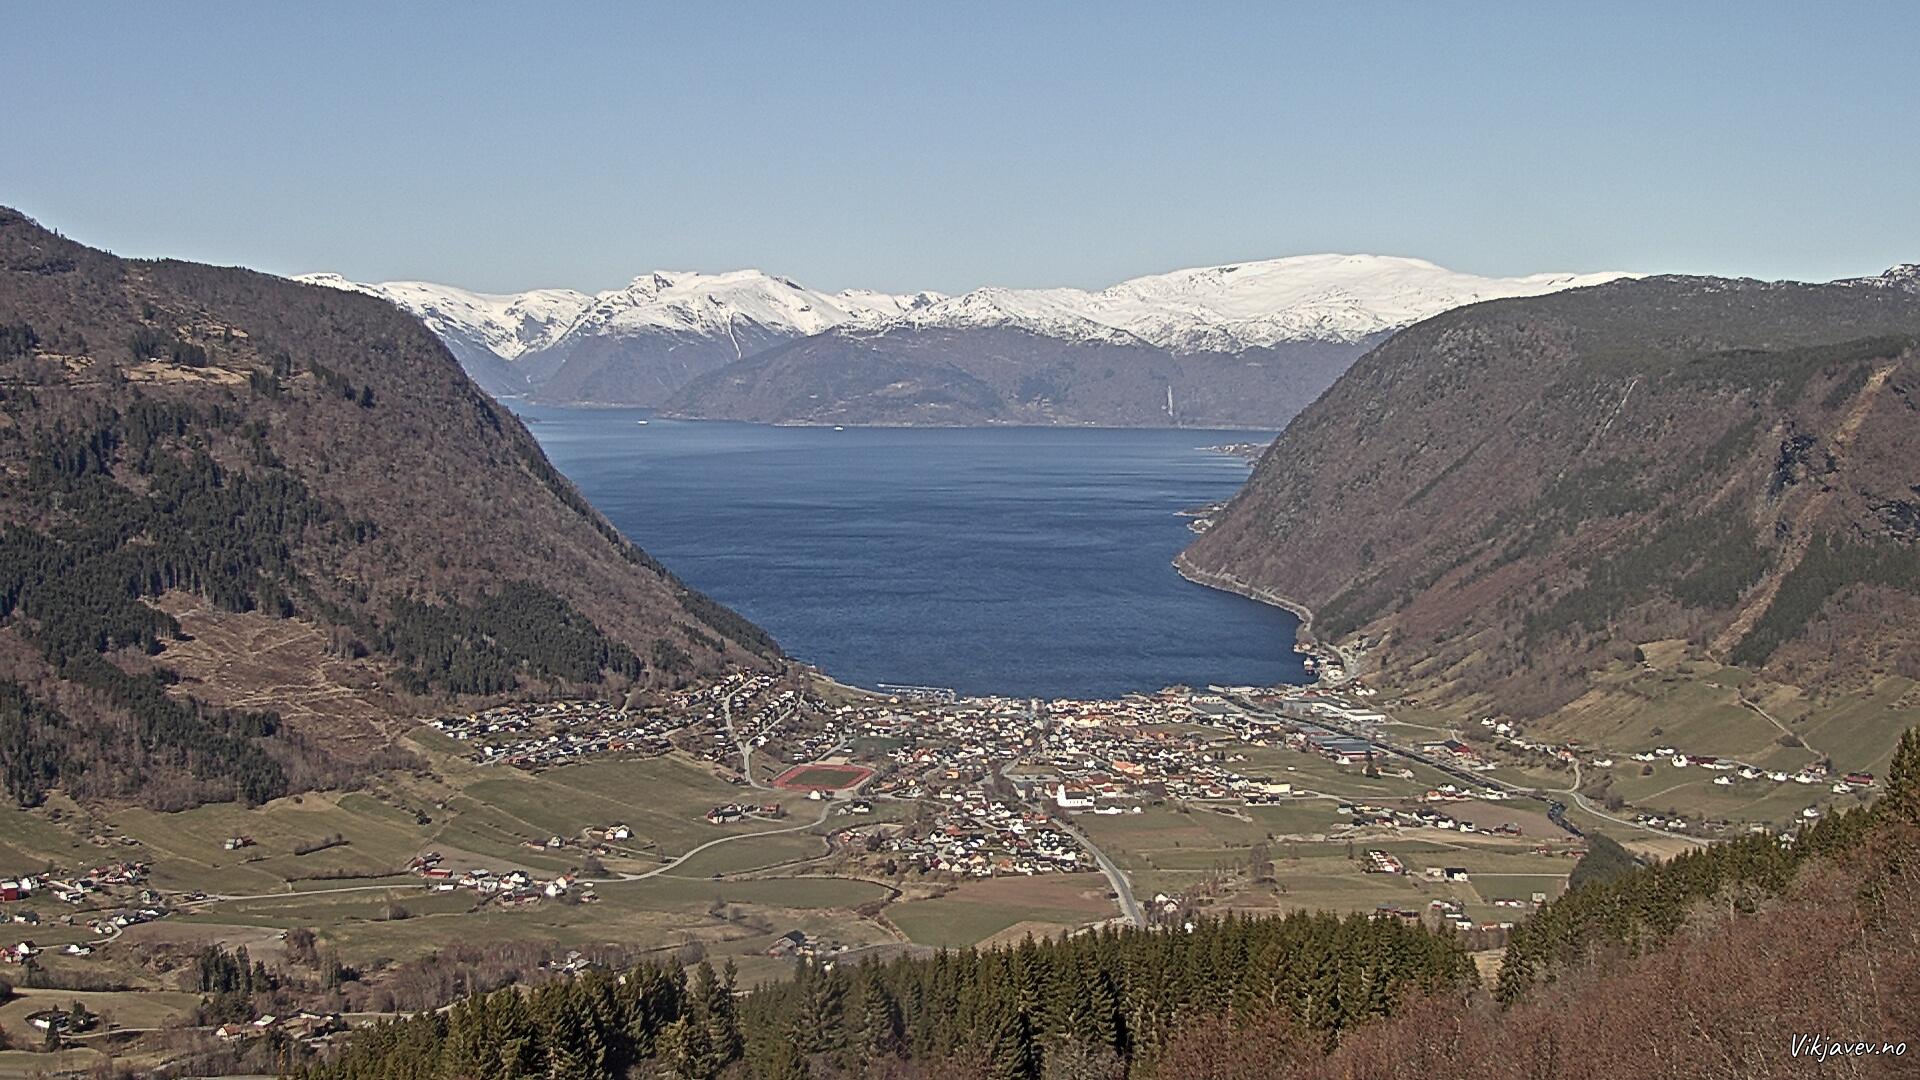 Vik i Sogn April 8, 2019 15:00